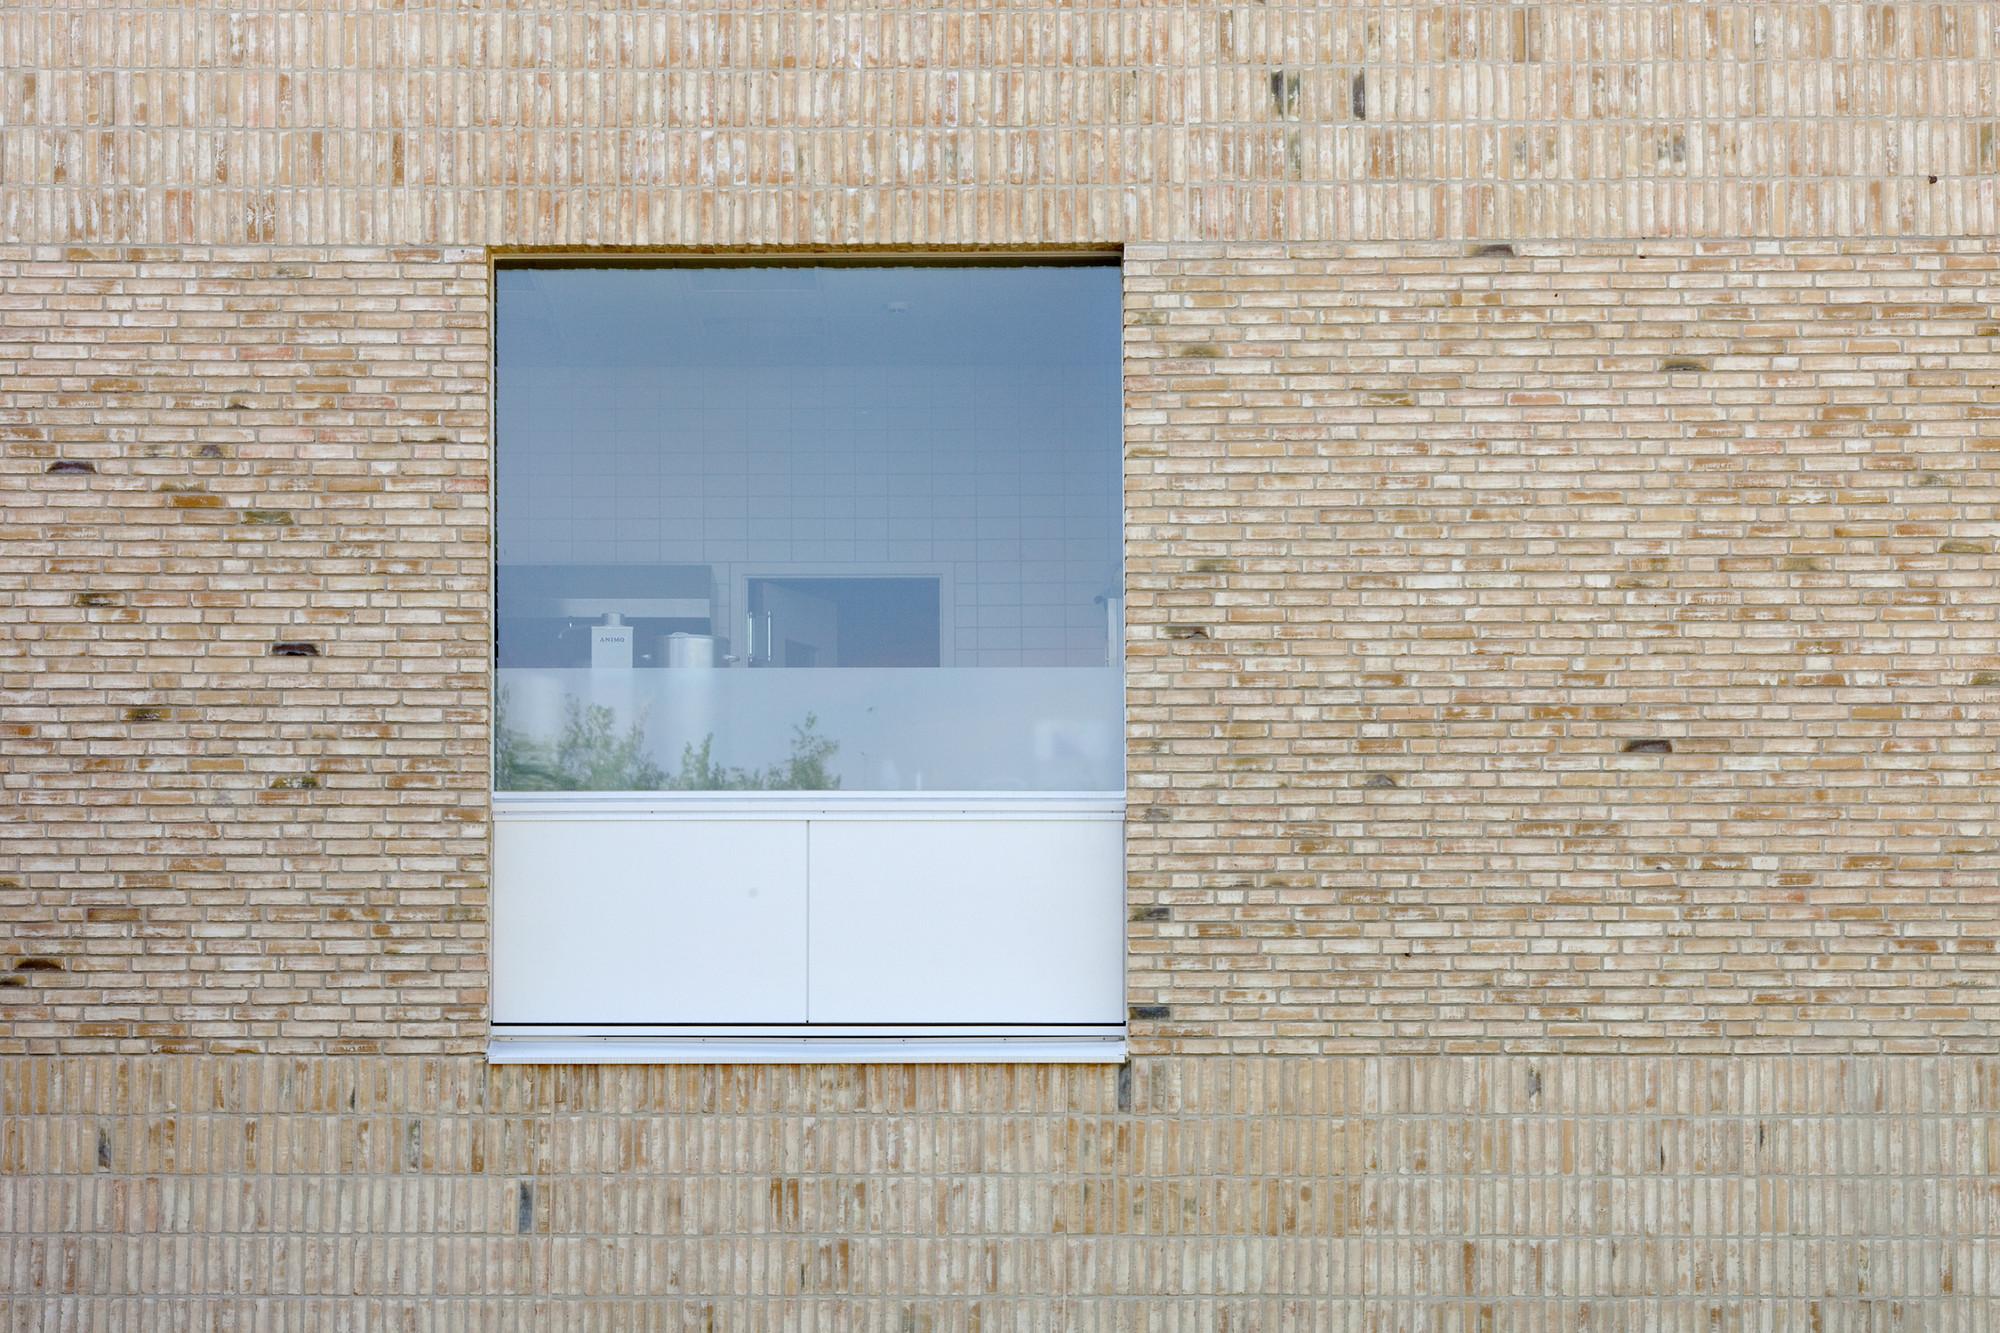 Scherpenzeel Multifuntional Complex / Slangen + Koenis Architects